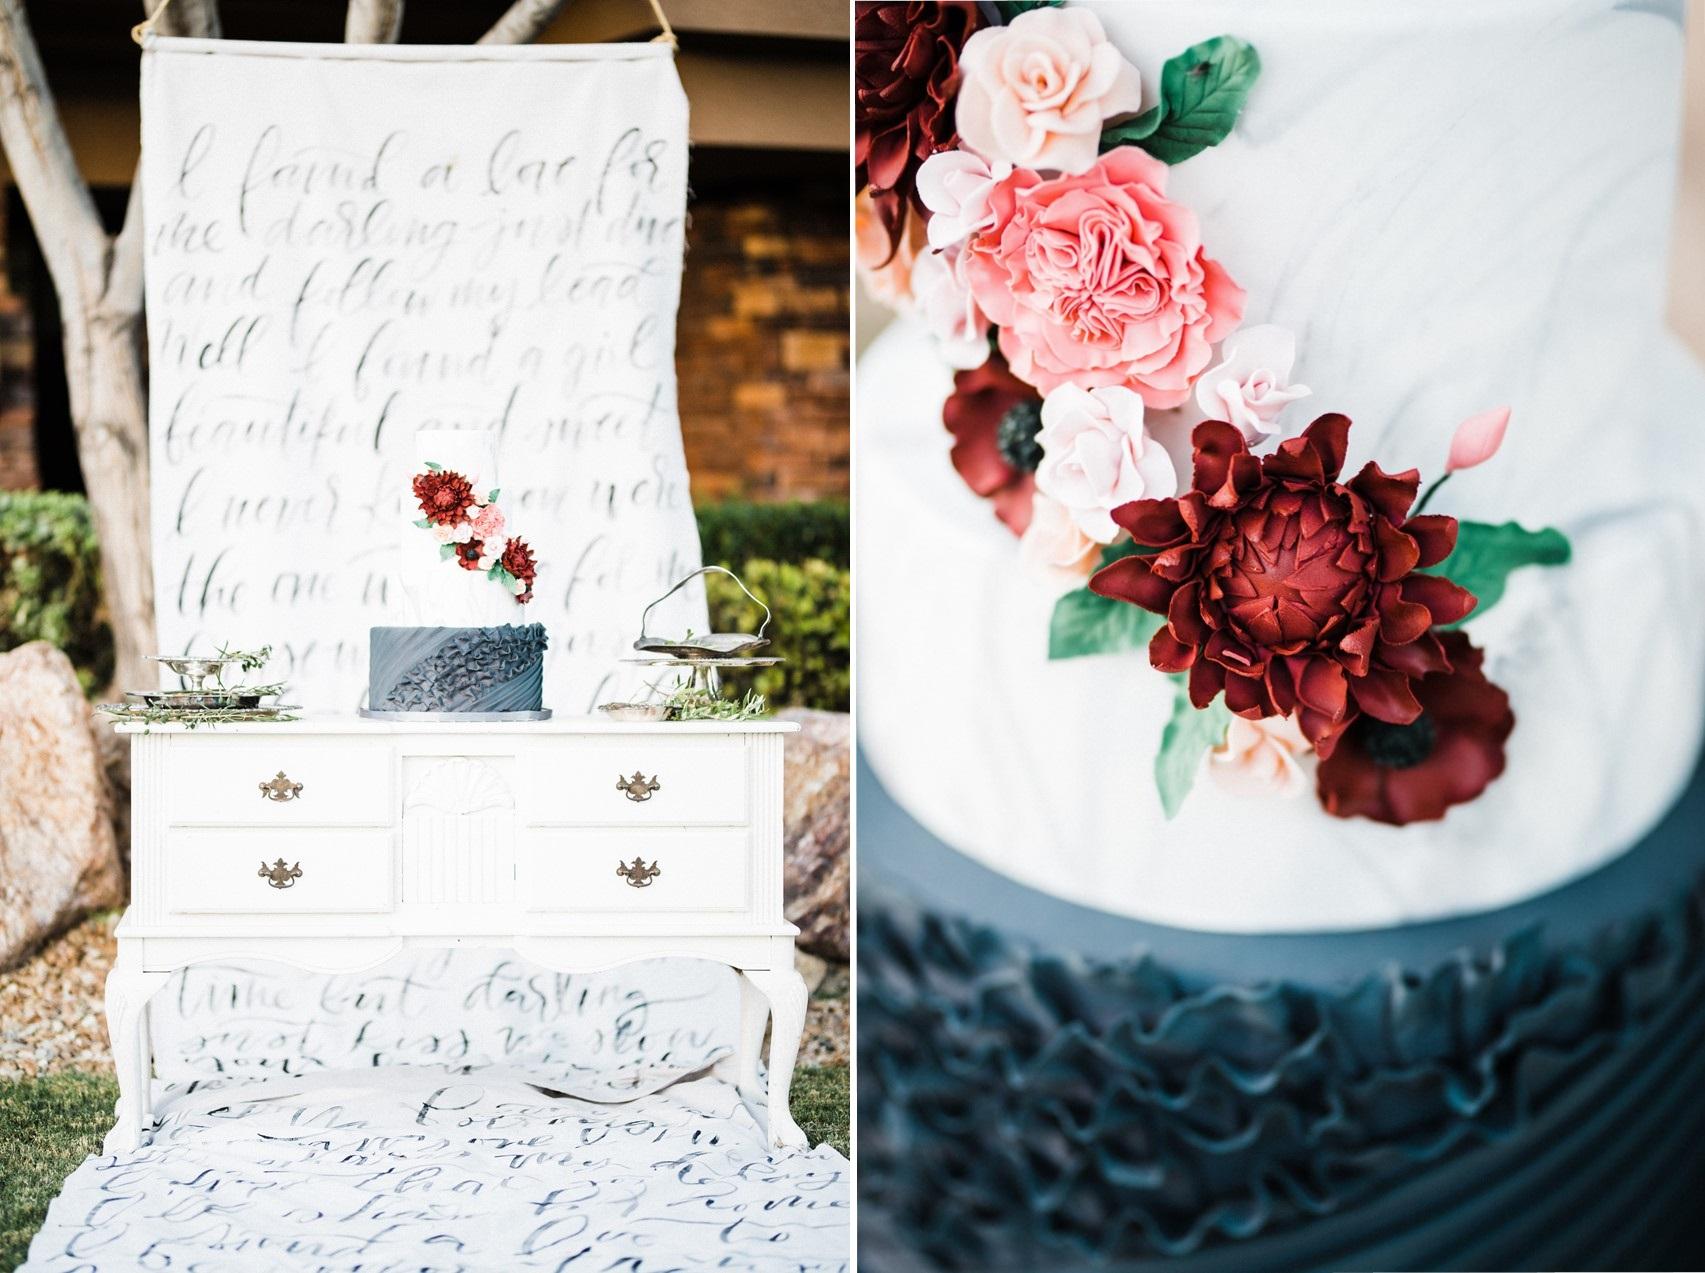 Floral & Ruffled Wedding Cake